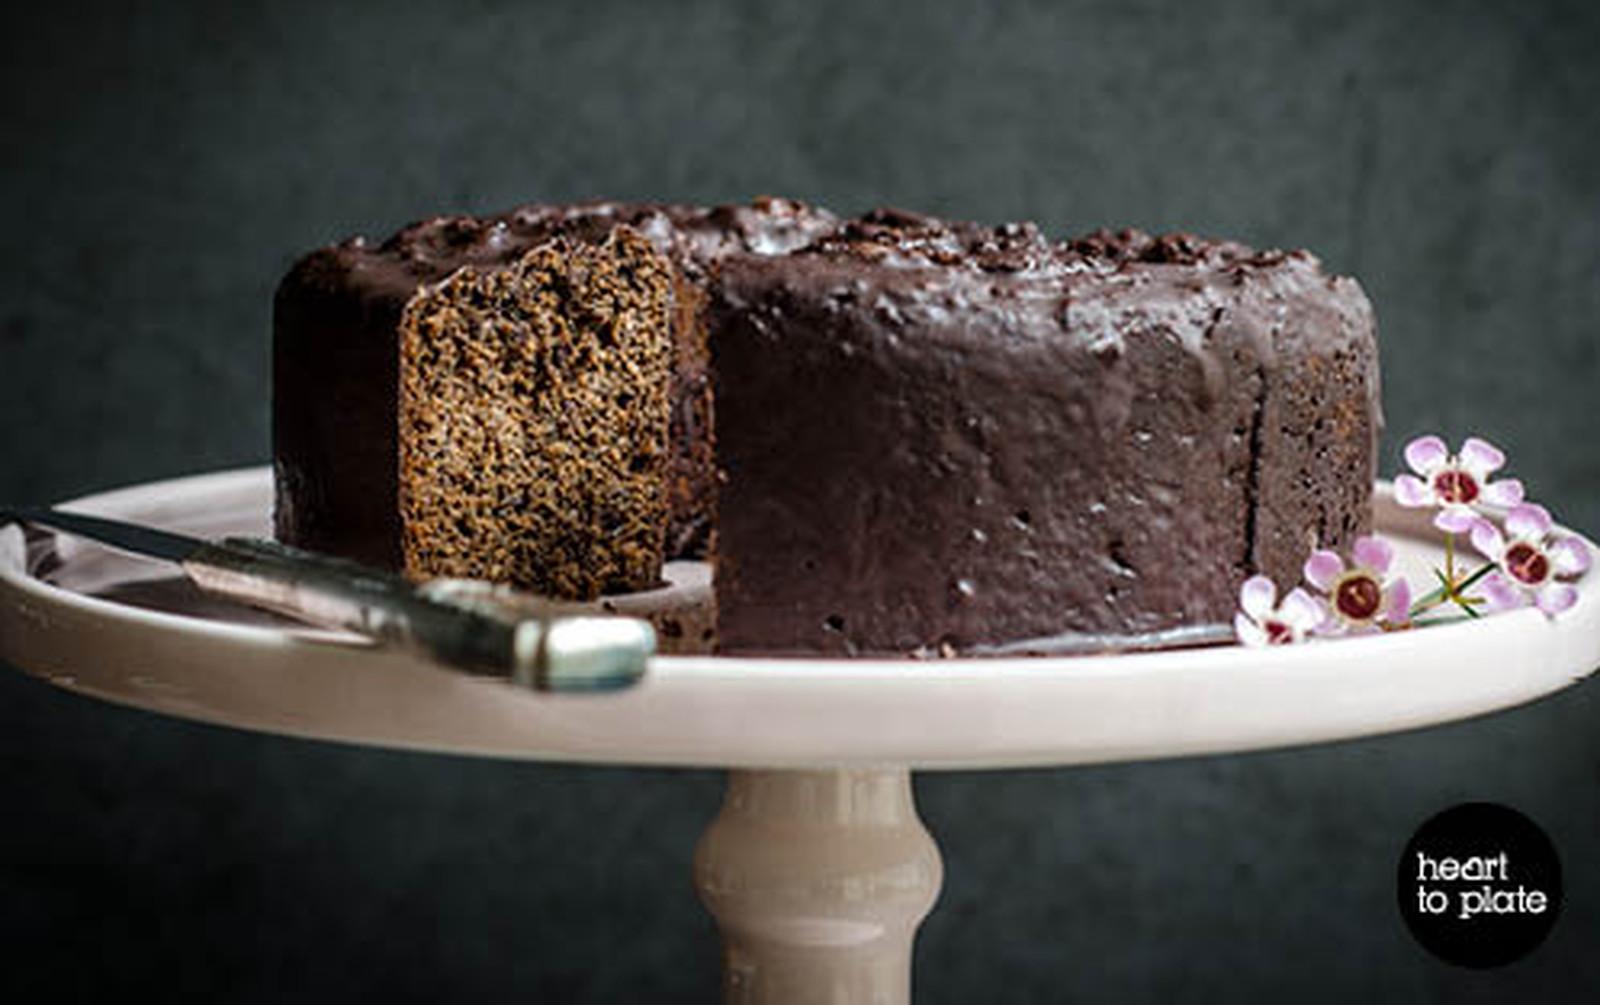 Poppy and Prune Cake ('Mohnkuchen') [Vegan, Gluten-Free]